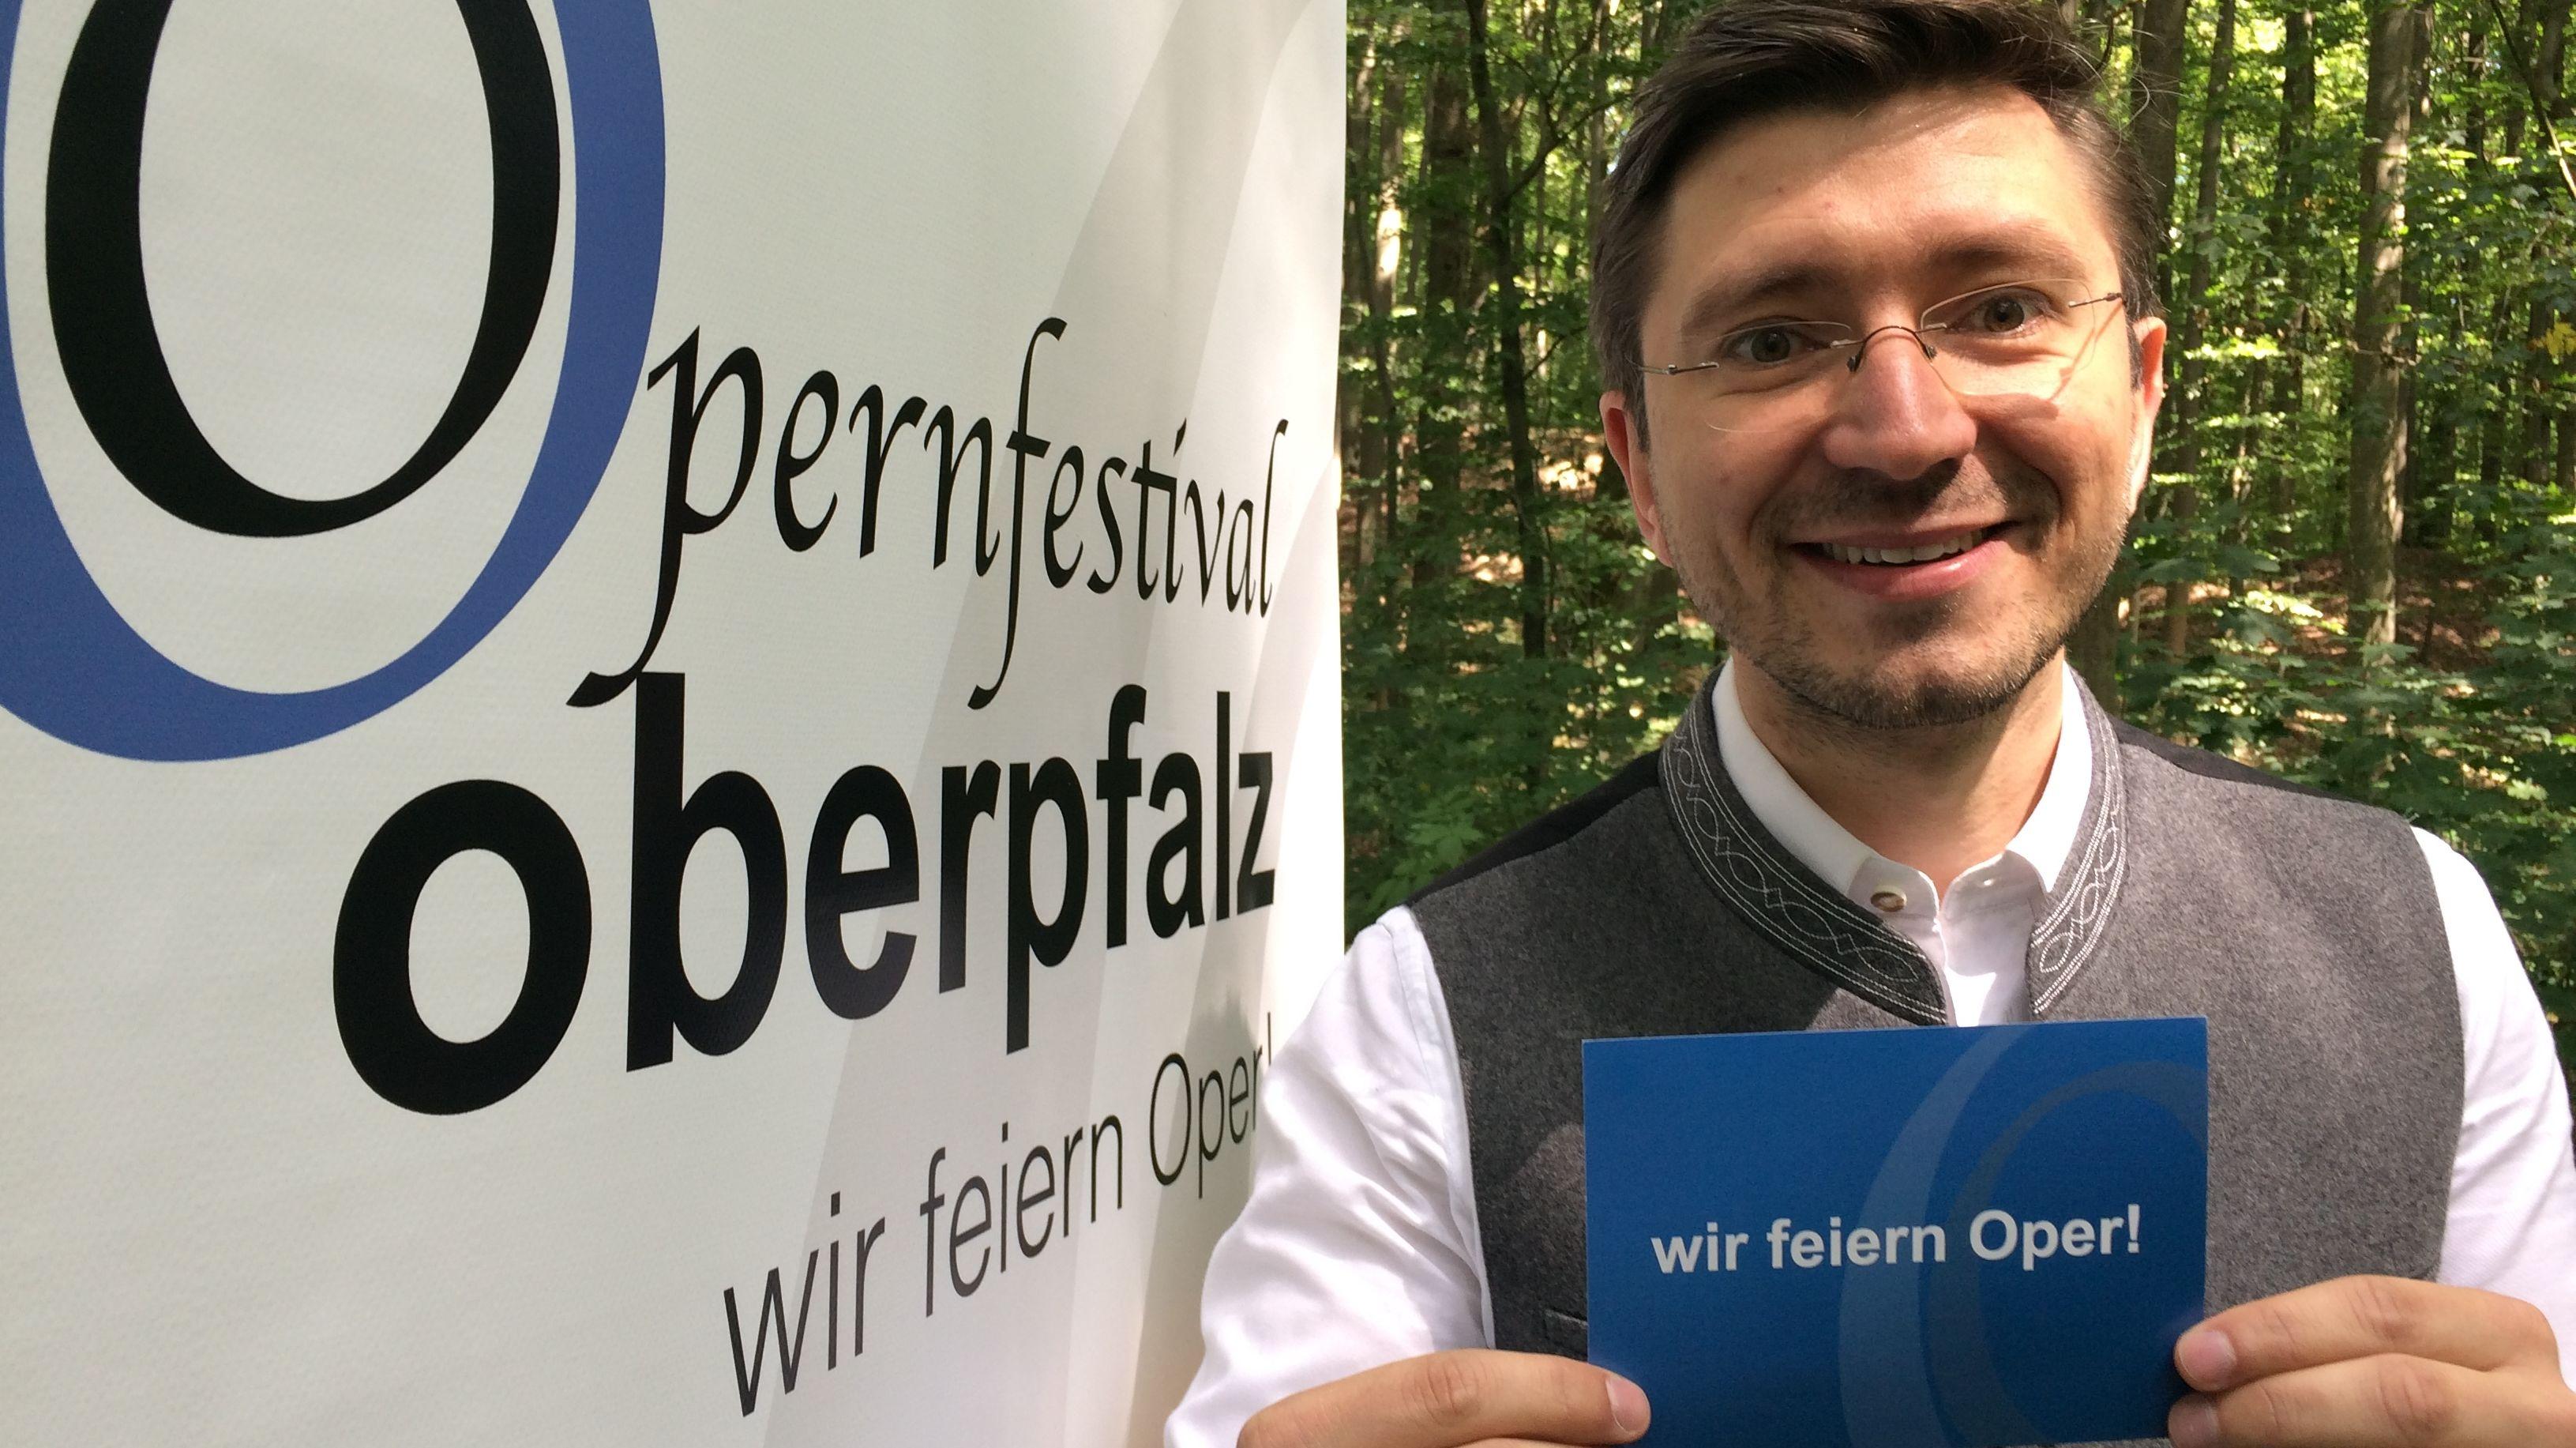 Michael Konstantin, Opernfestival Oberpfalz